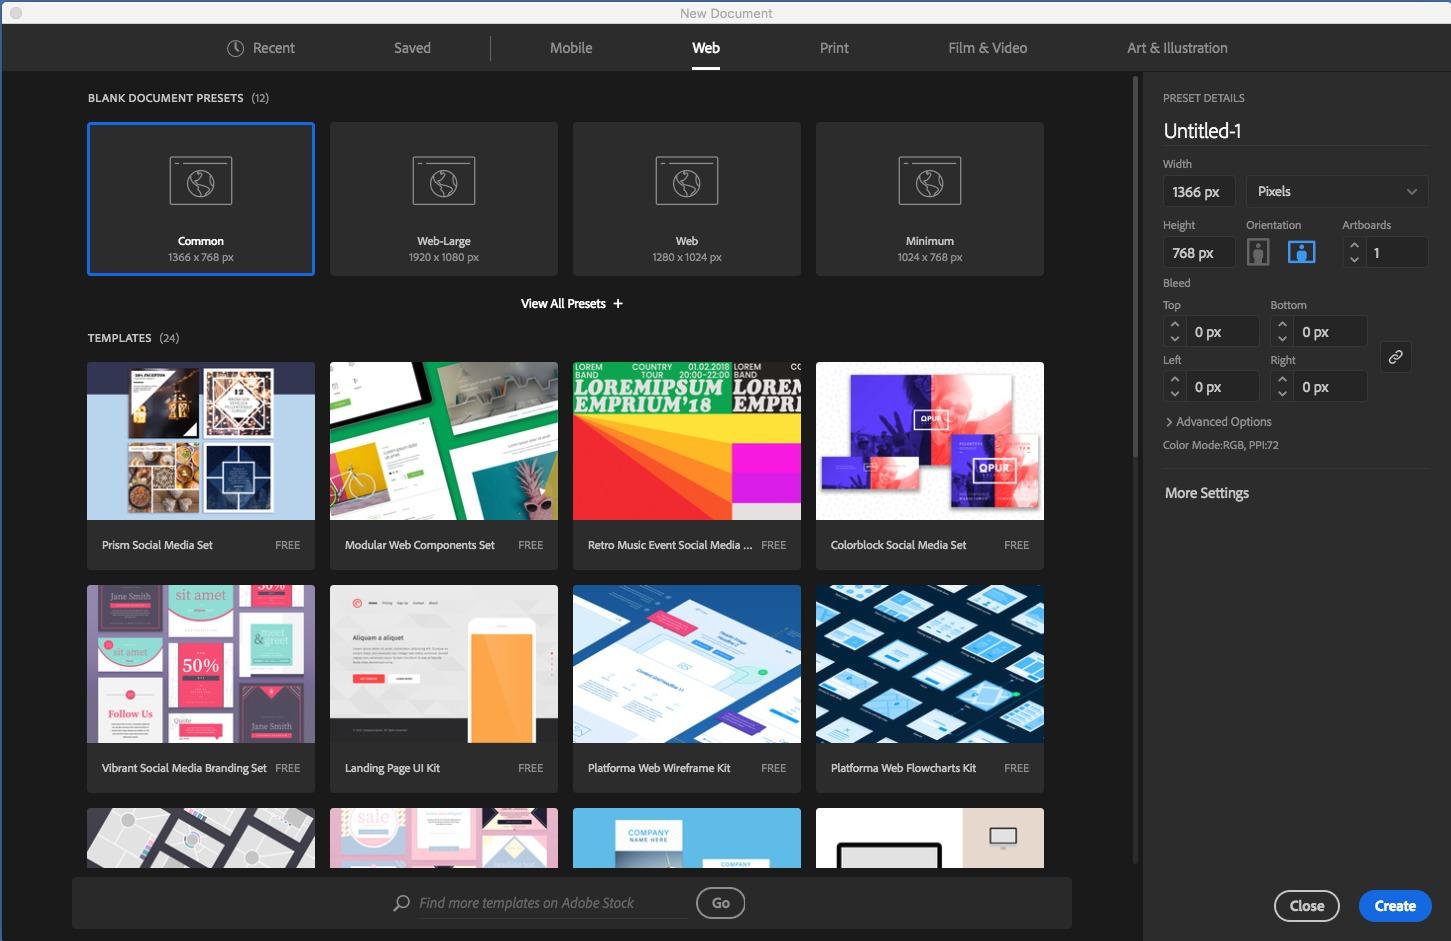 Adobe Illustrator Cc 23 0 1 Fixed Professional